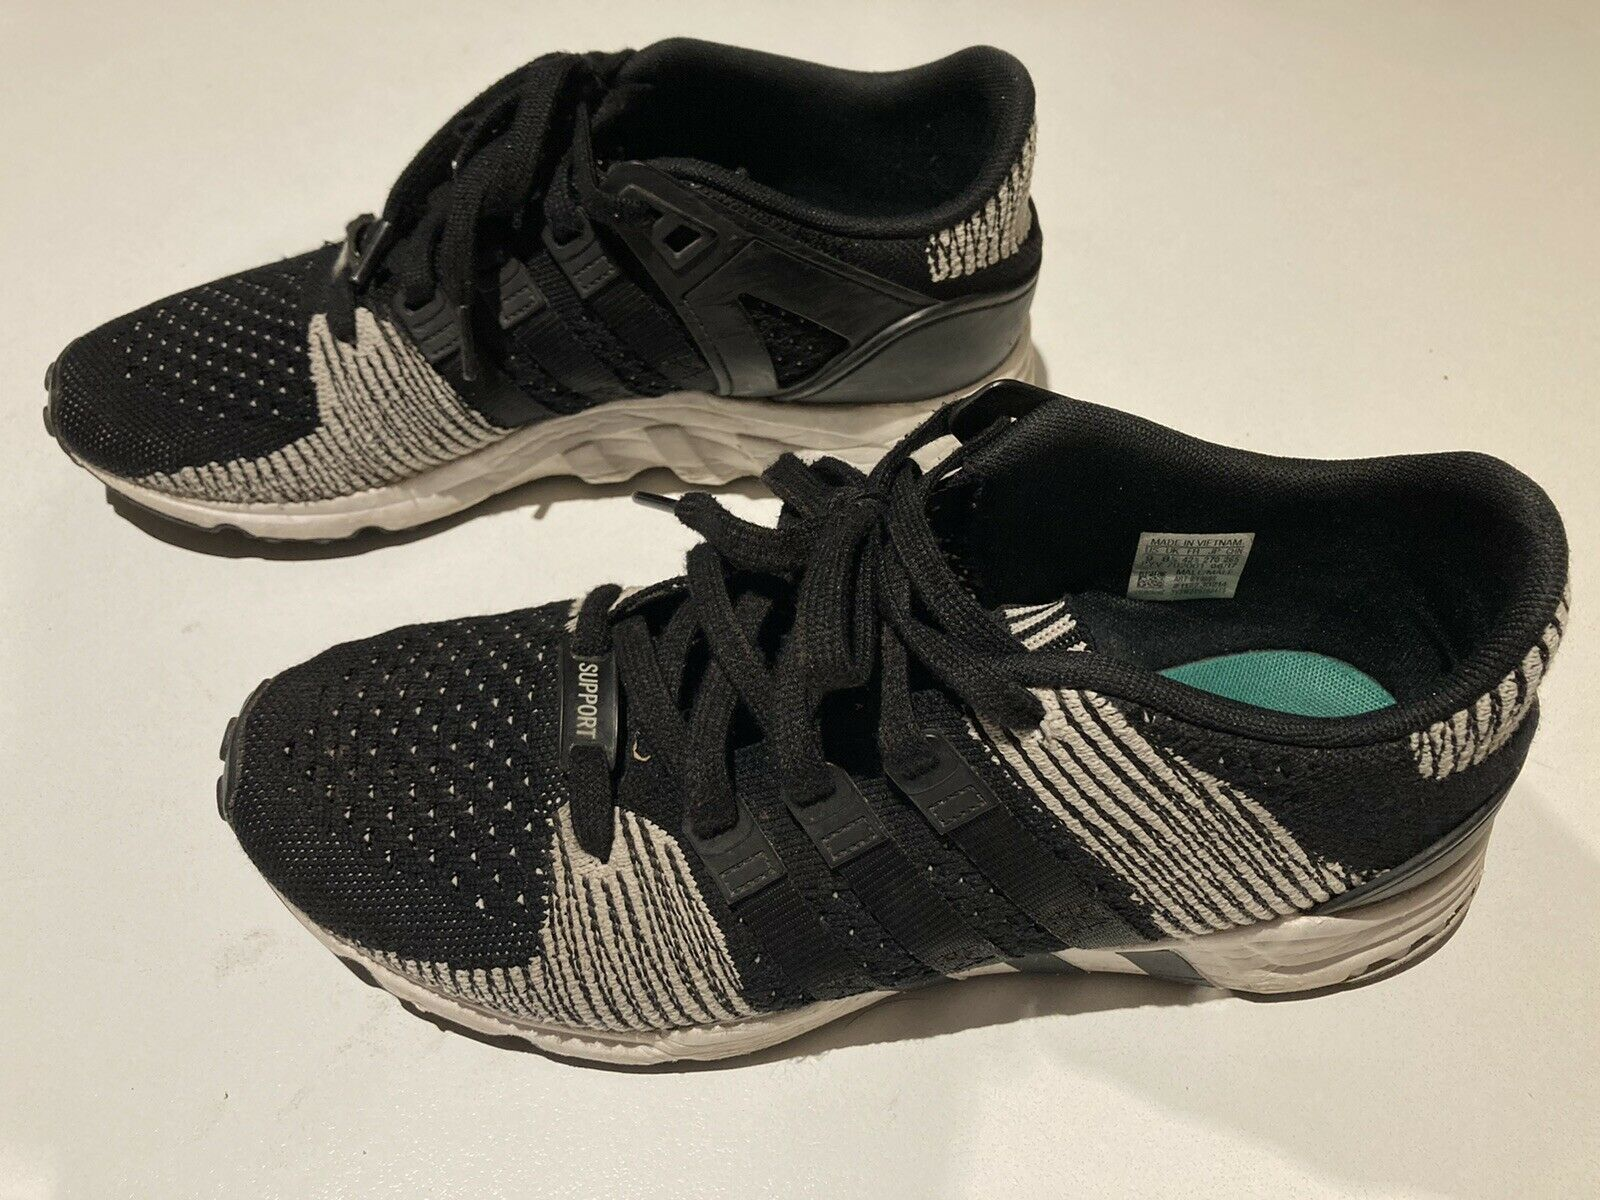 eqt support rf primeknit shoes